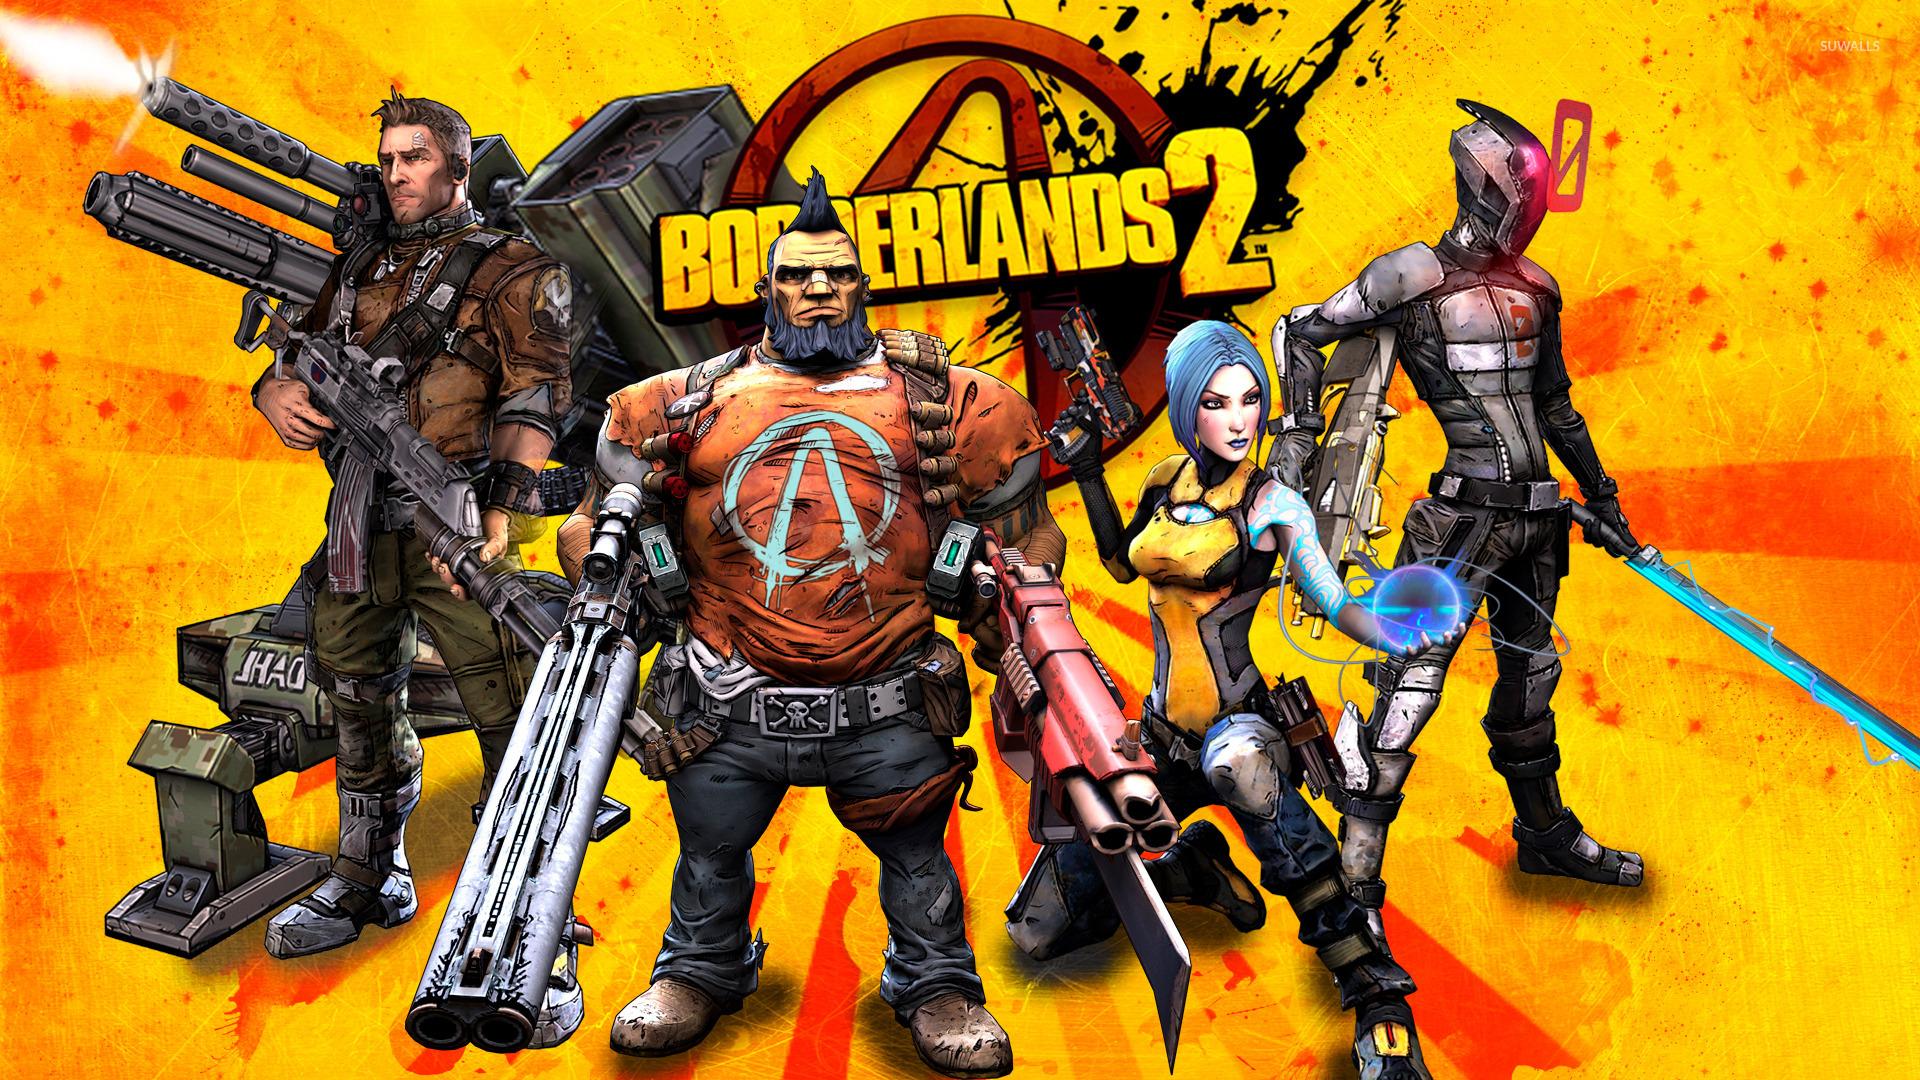 Borderlands 2 6 Wallpaper Game Wallpapers 23095